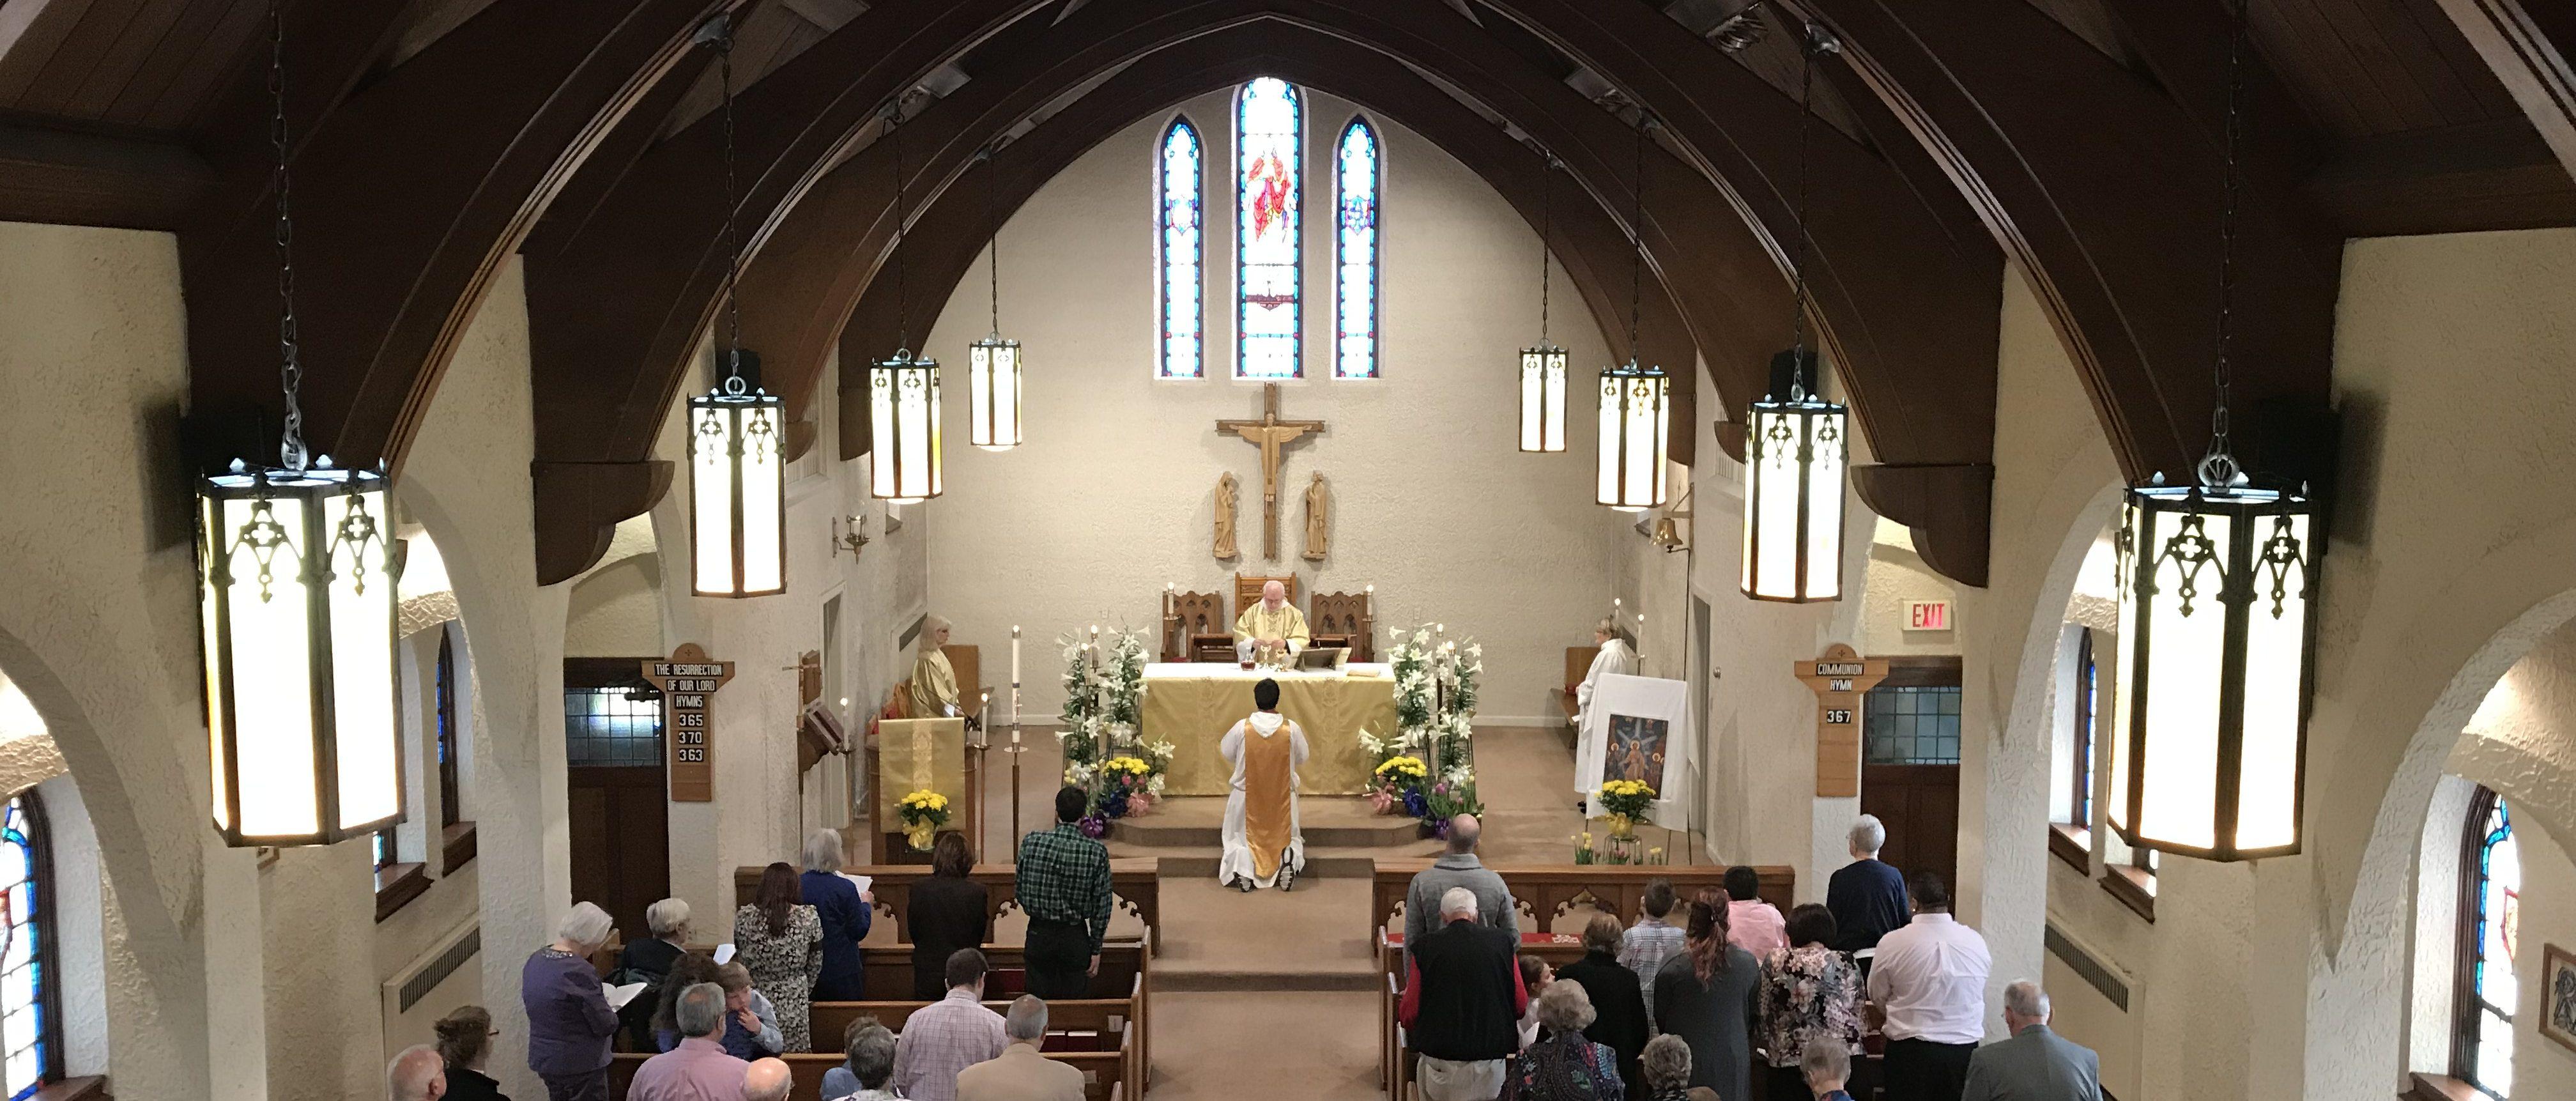 home evangelical lutheran church in america - HD4032×1723